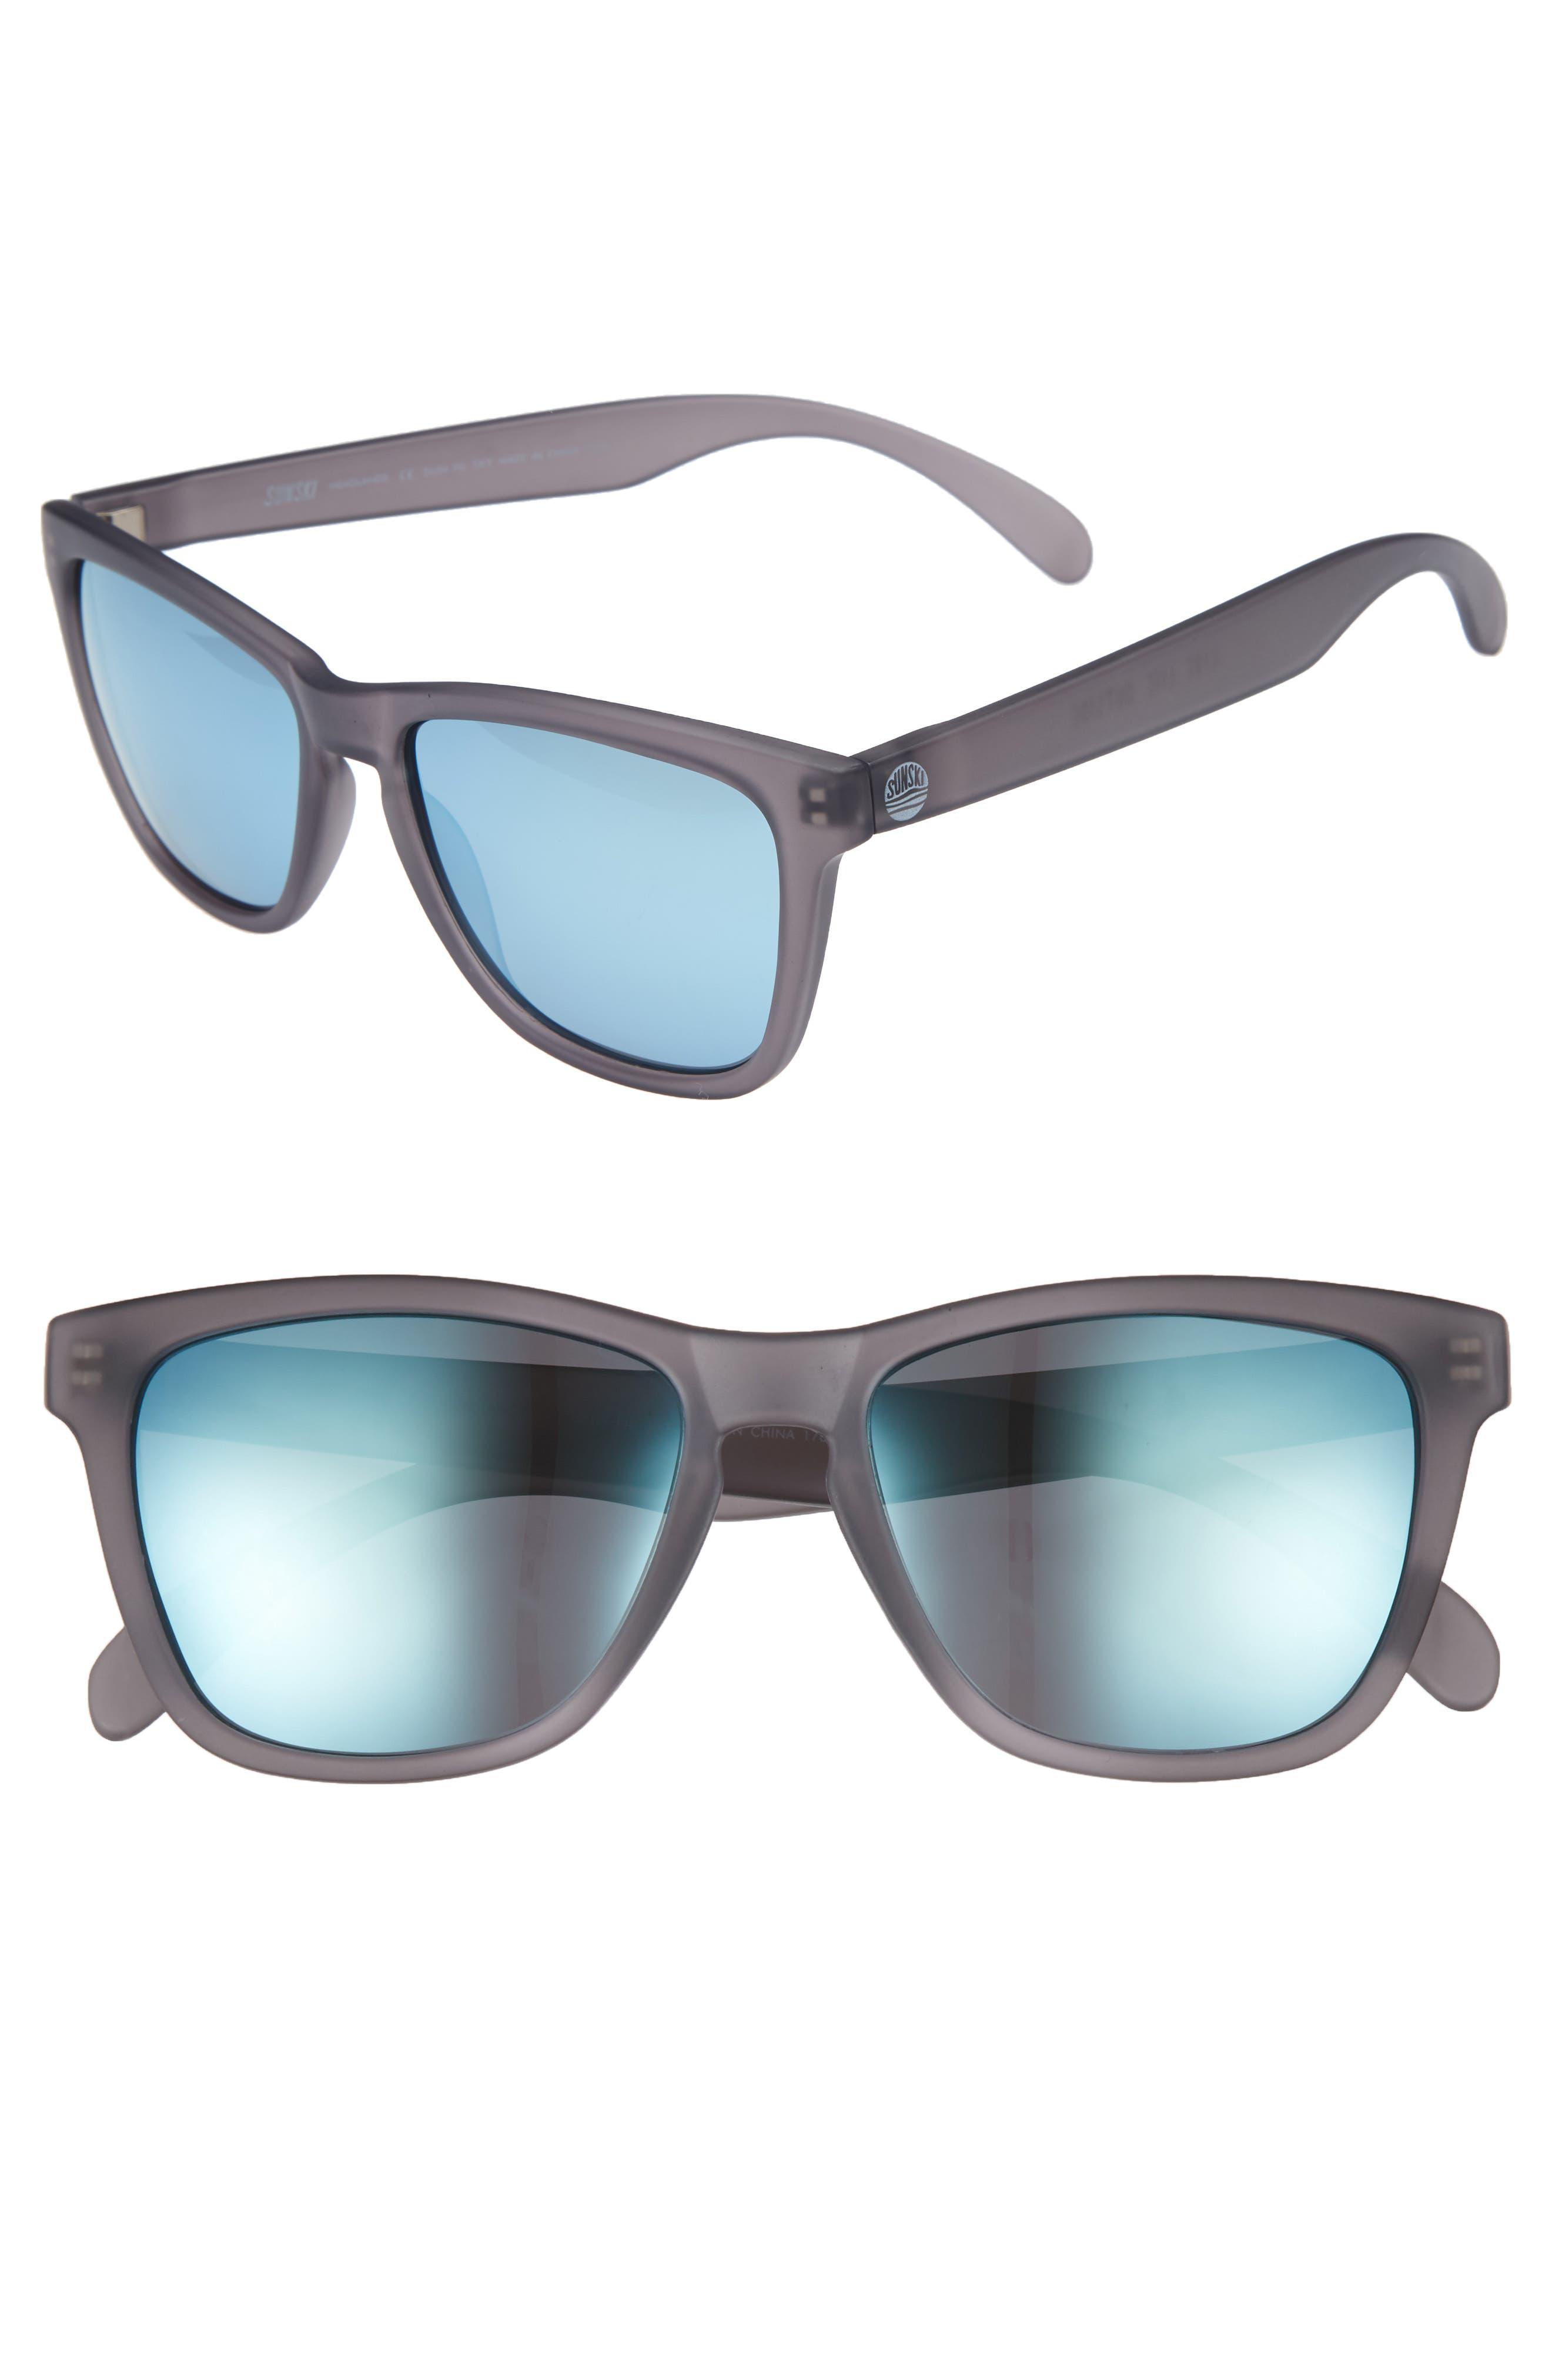 Main Image - Sunski Headlands 53mm Polarized Sunglasses